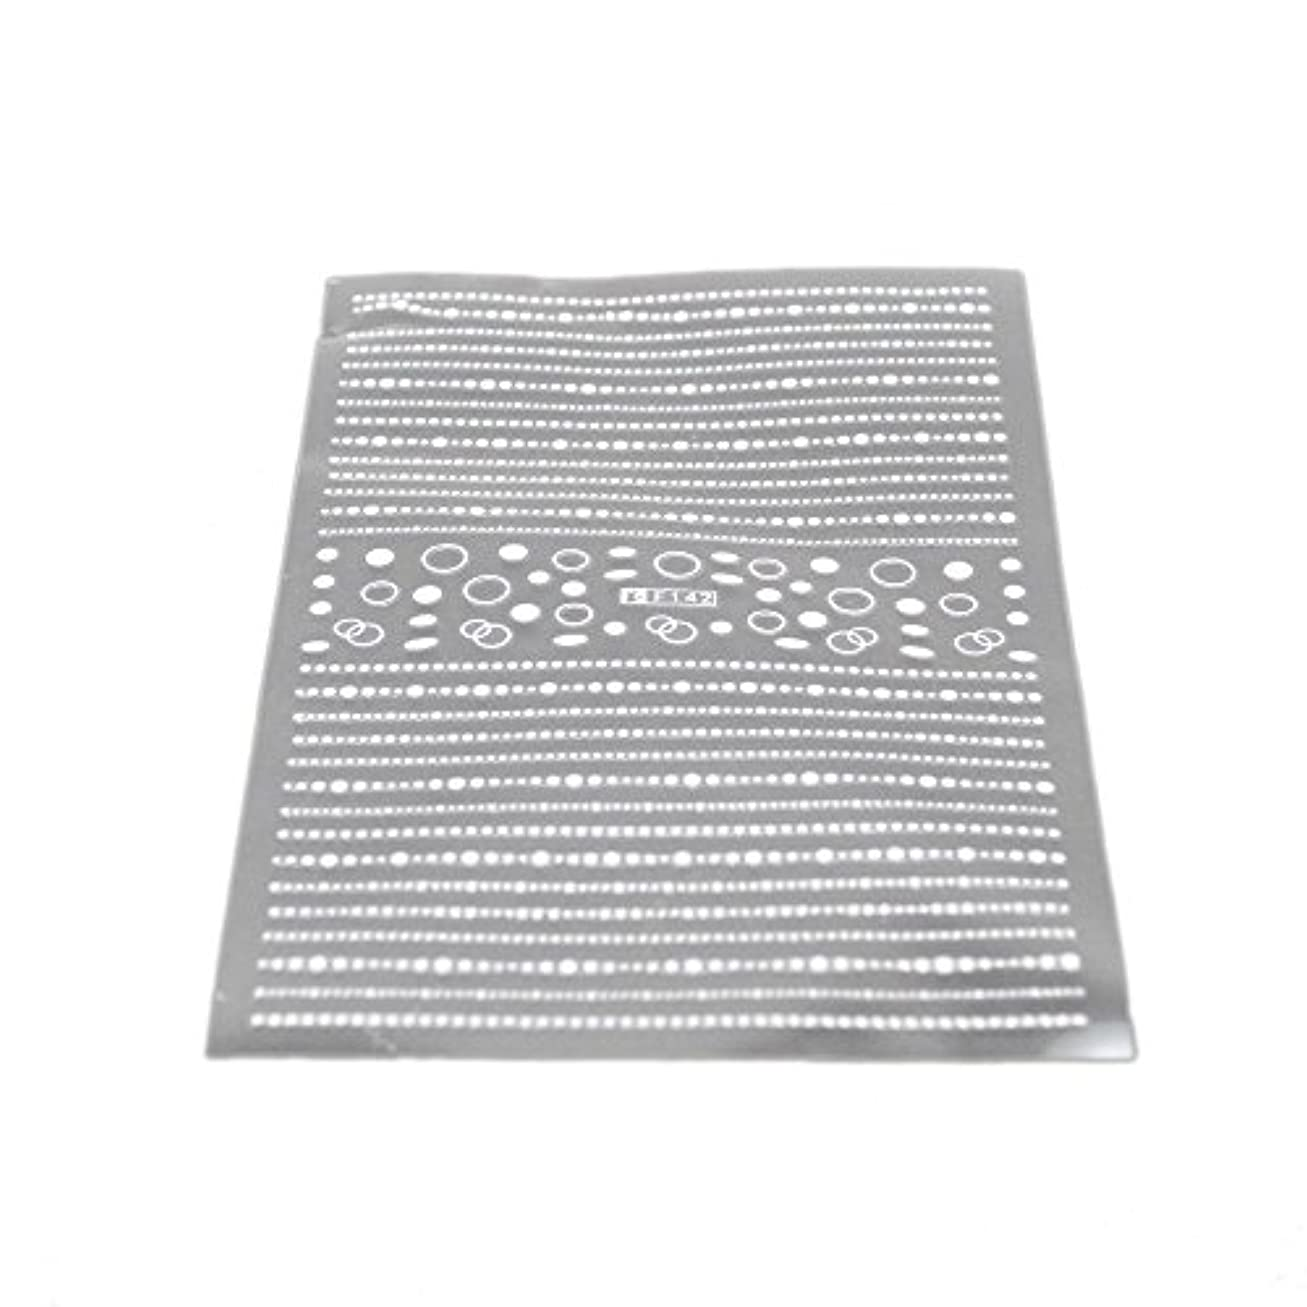 Nina ネイルステッカー 【12.5cm×7.5cm ホワイトドットライン 2枚セット】ネイルシール テープ デコパーツ クラフト素材